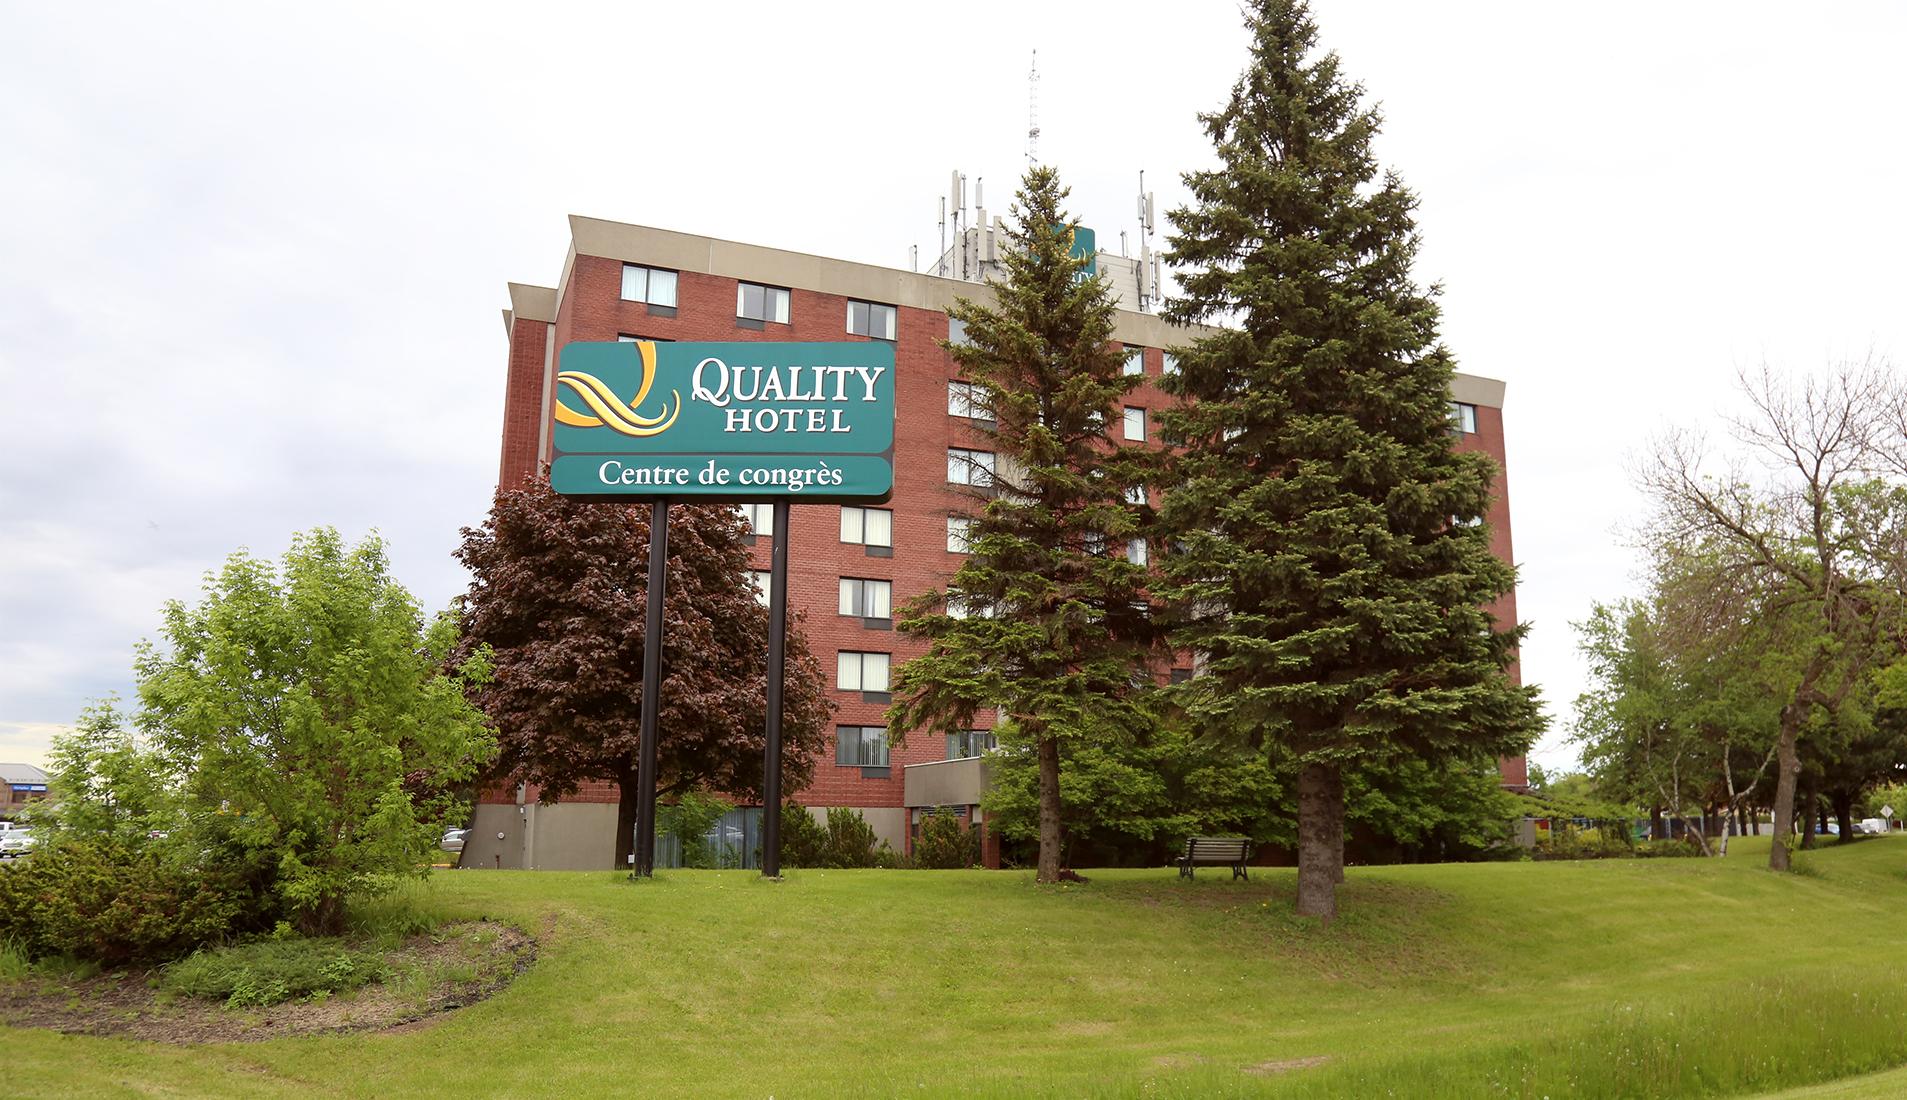 Quality-Hotel-1ig.jpg